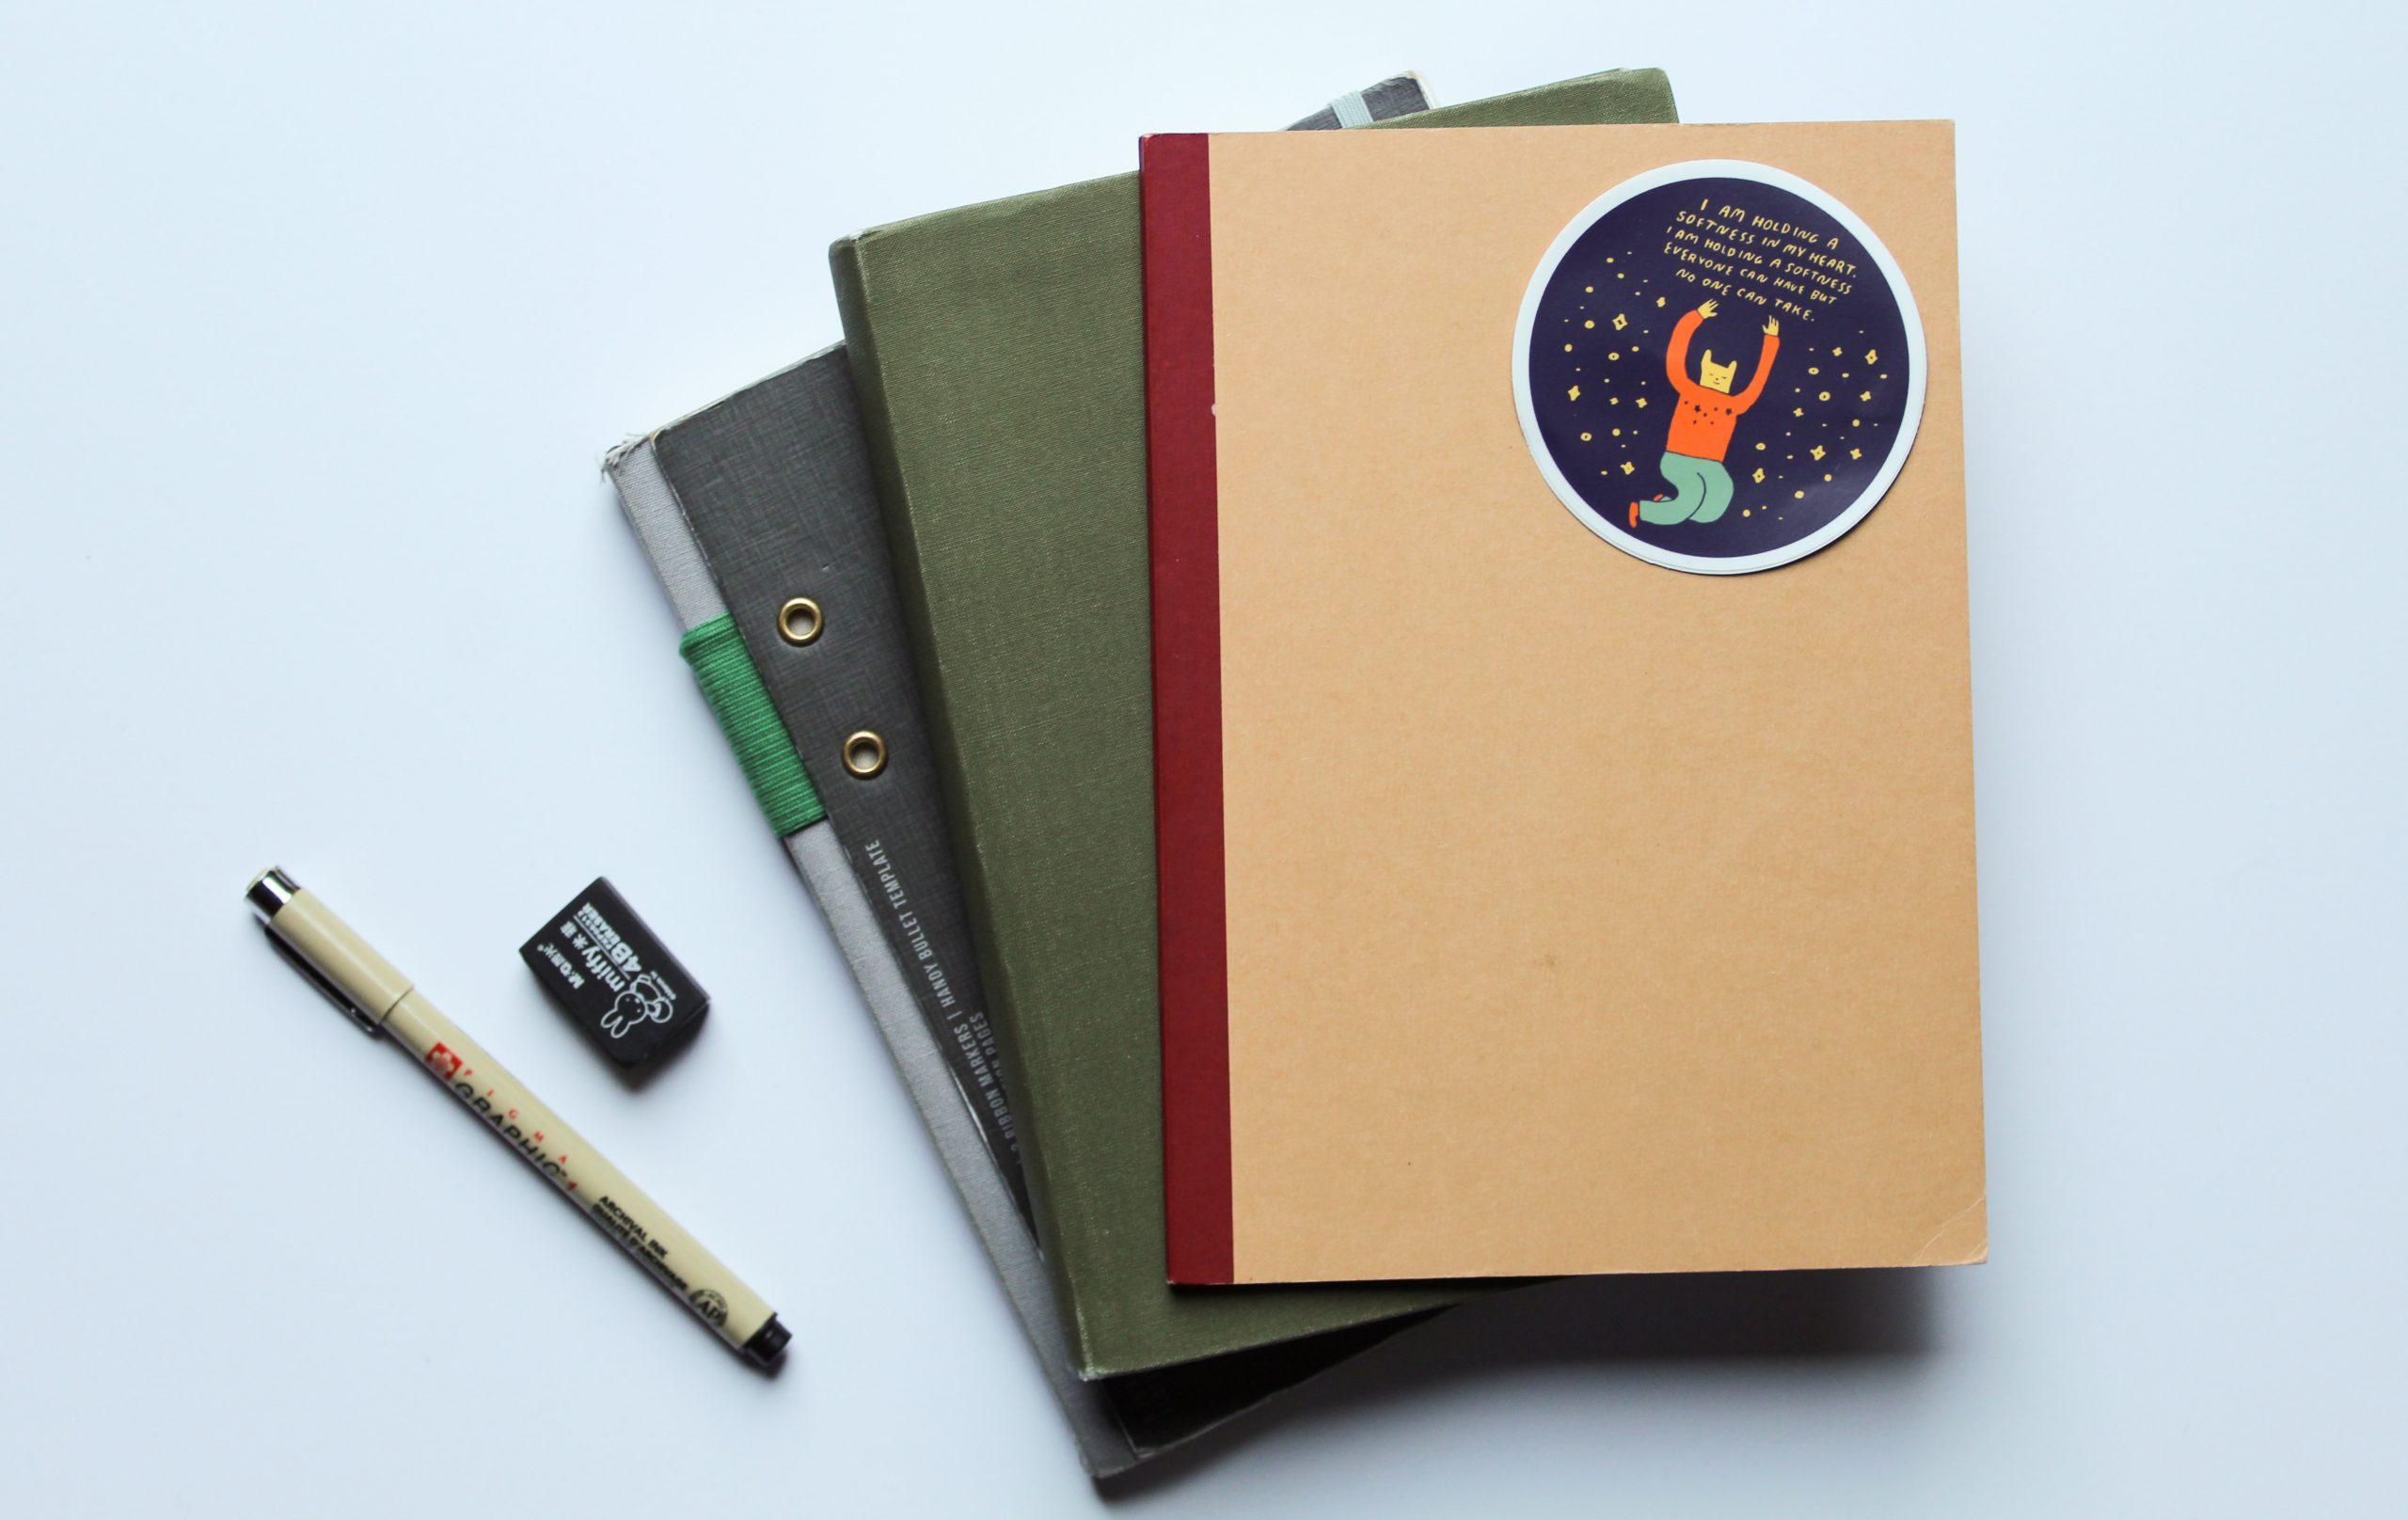 Habit forming: Beginner guide